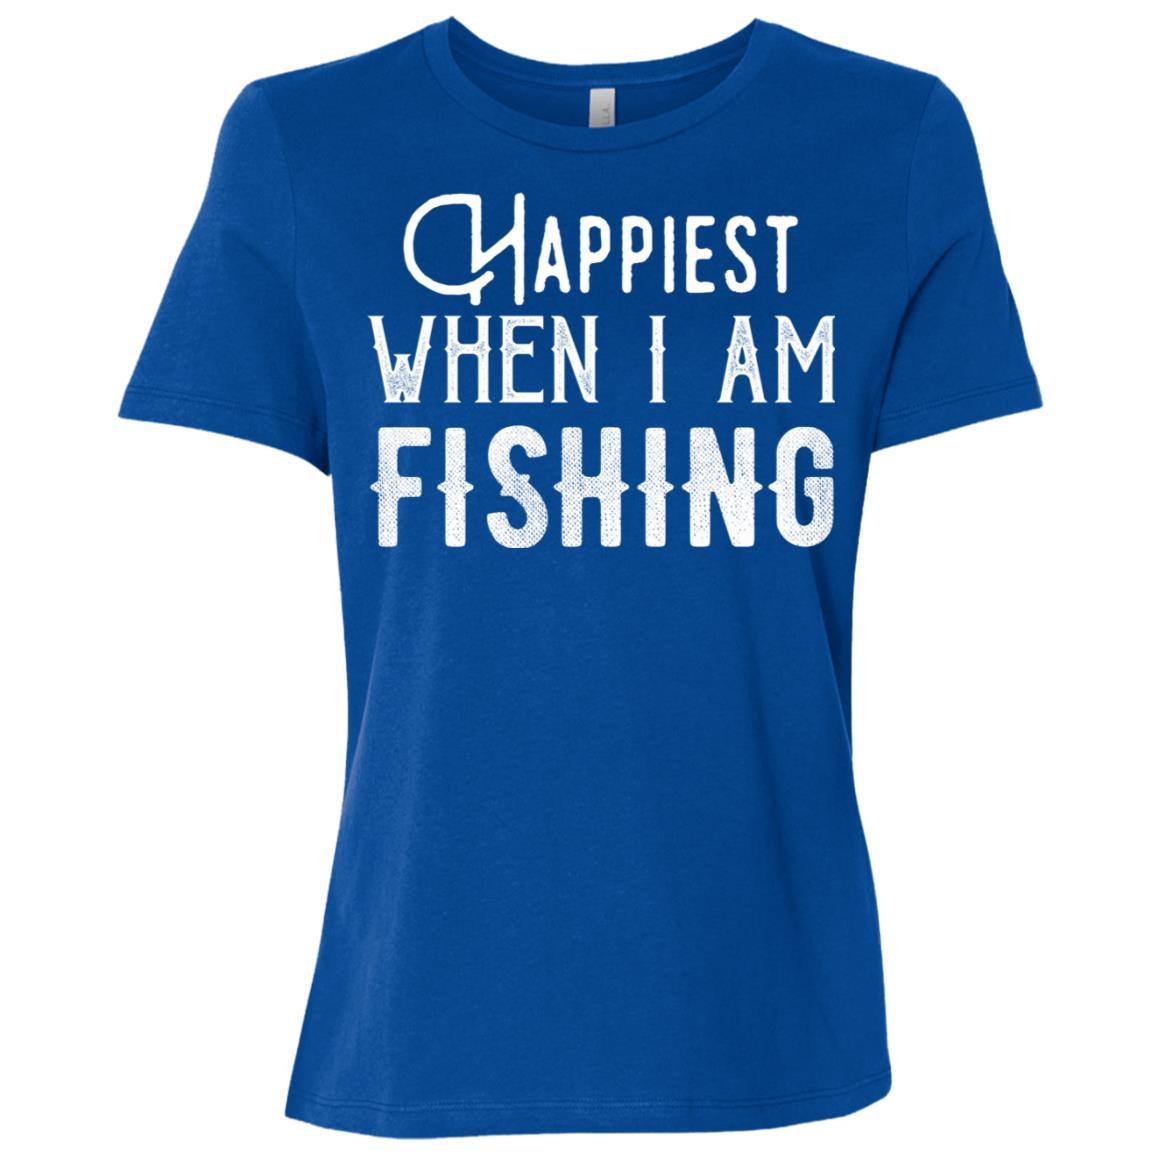 Happiest When I Am Fishing Gift Ideas Women Short Sleeve T-Shirt